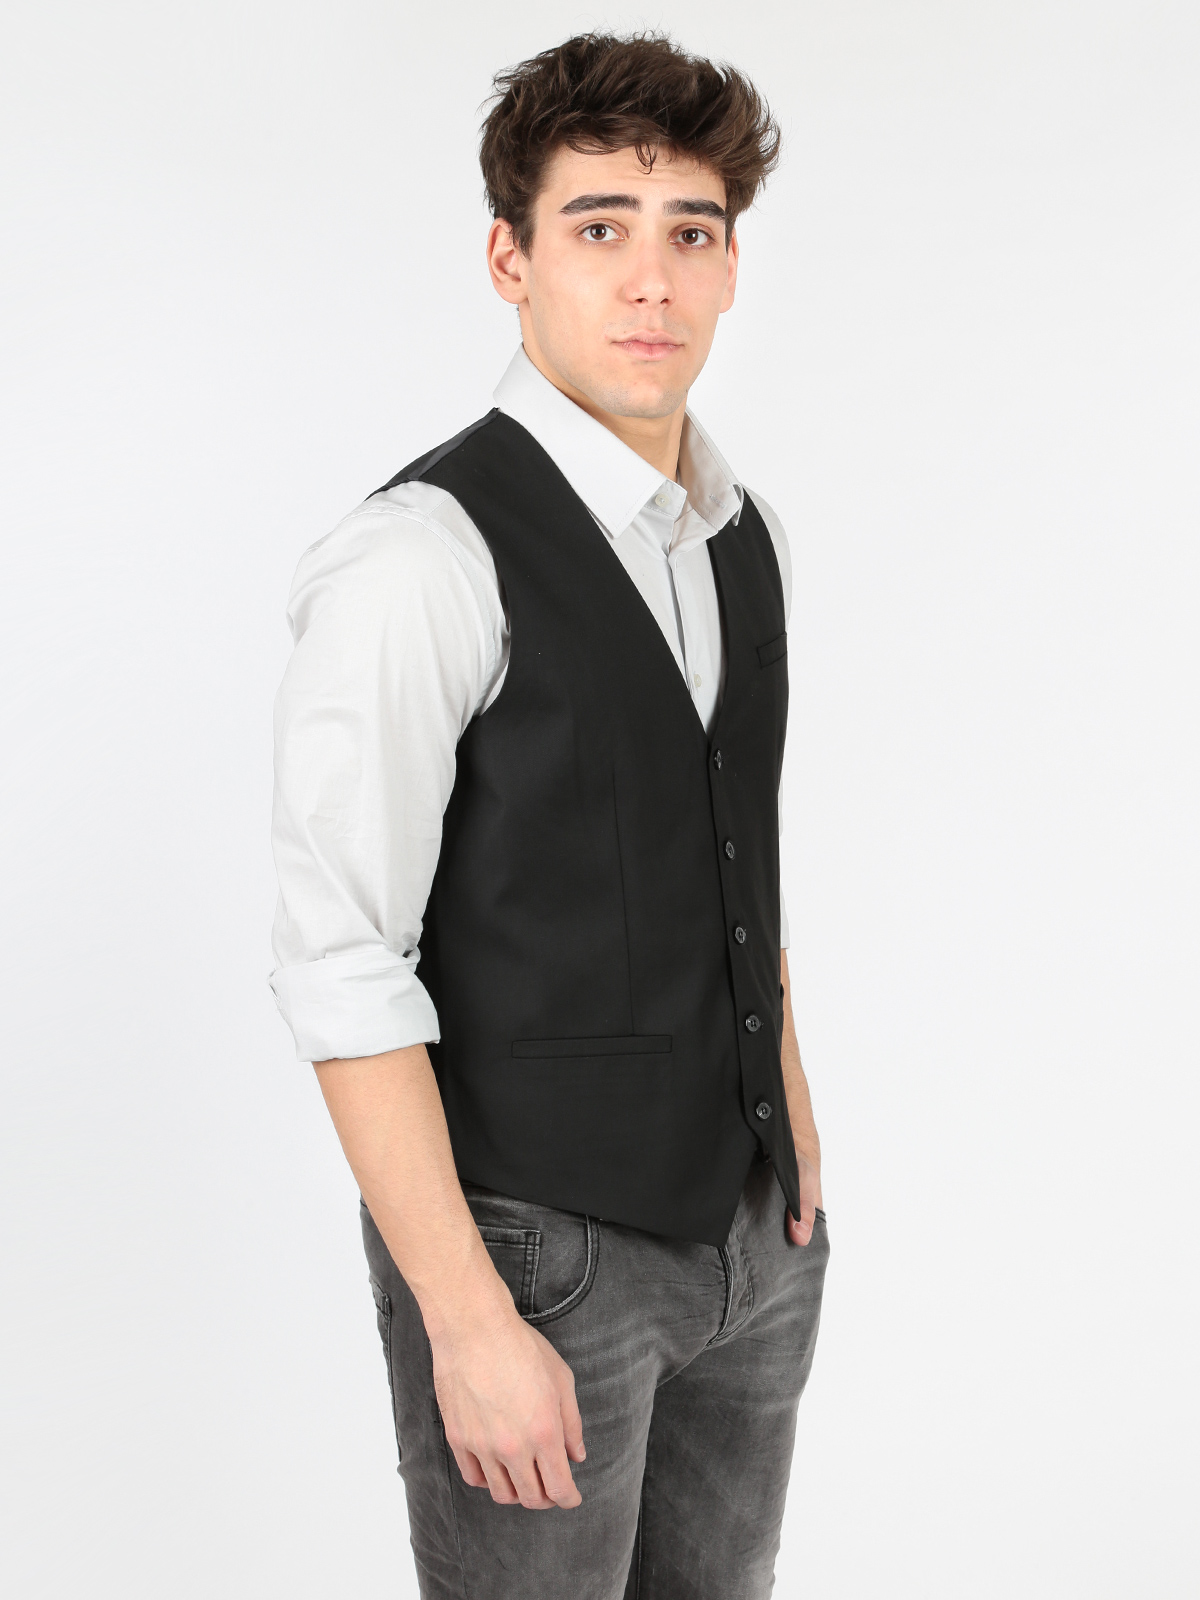 Black Vest Elegant